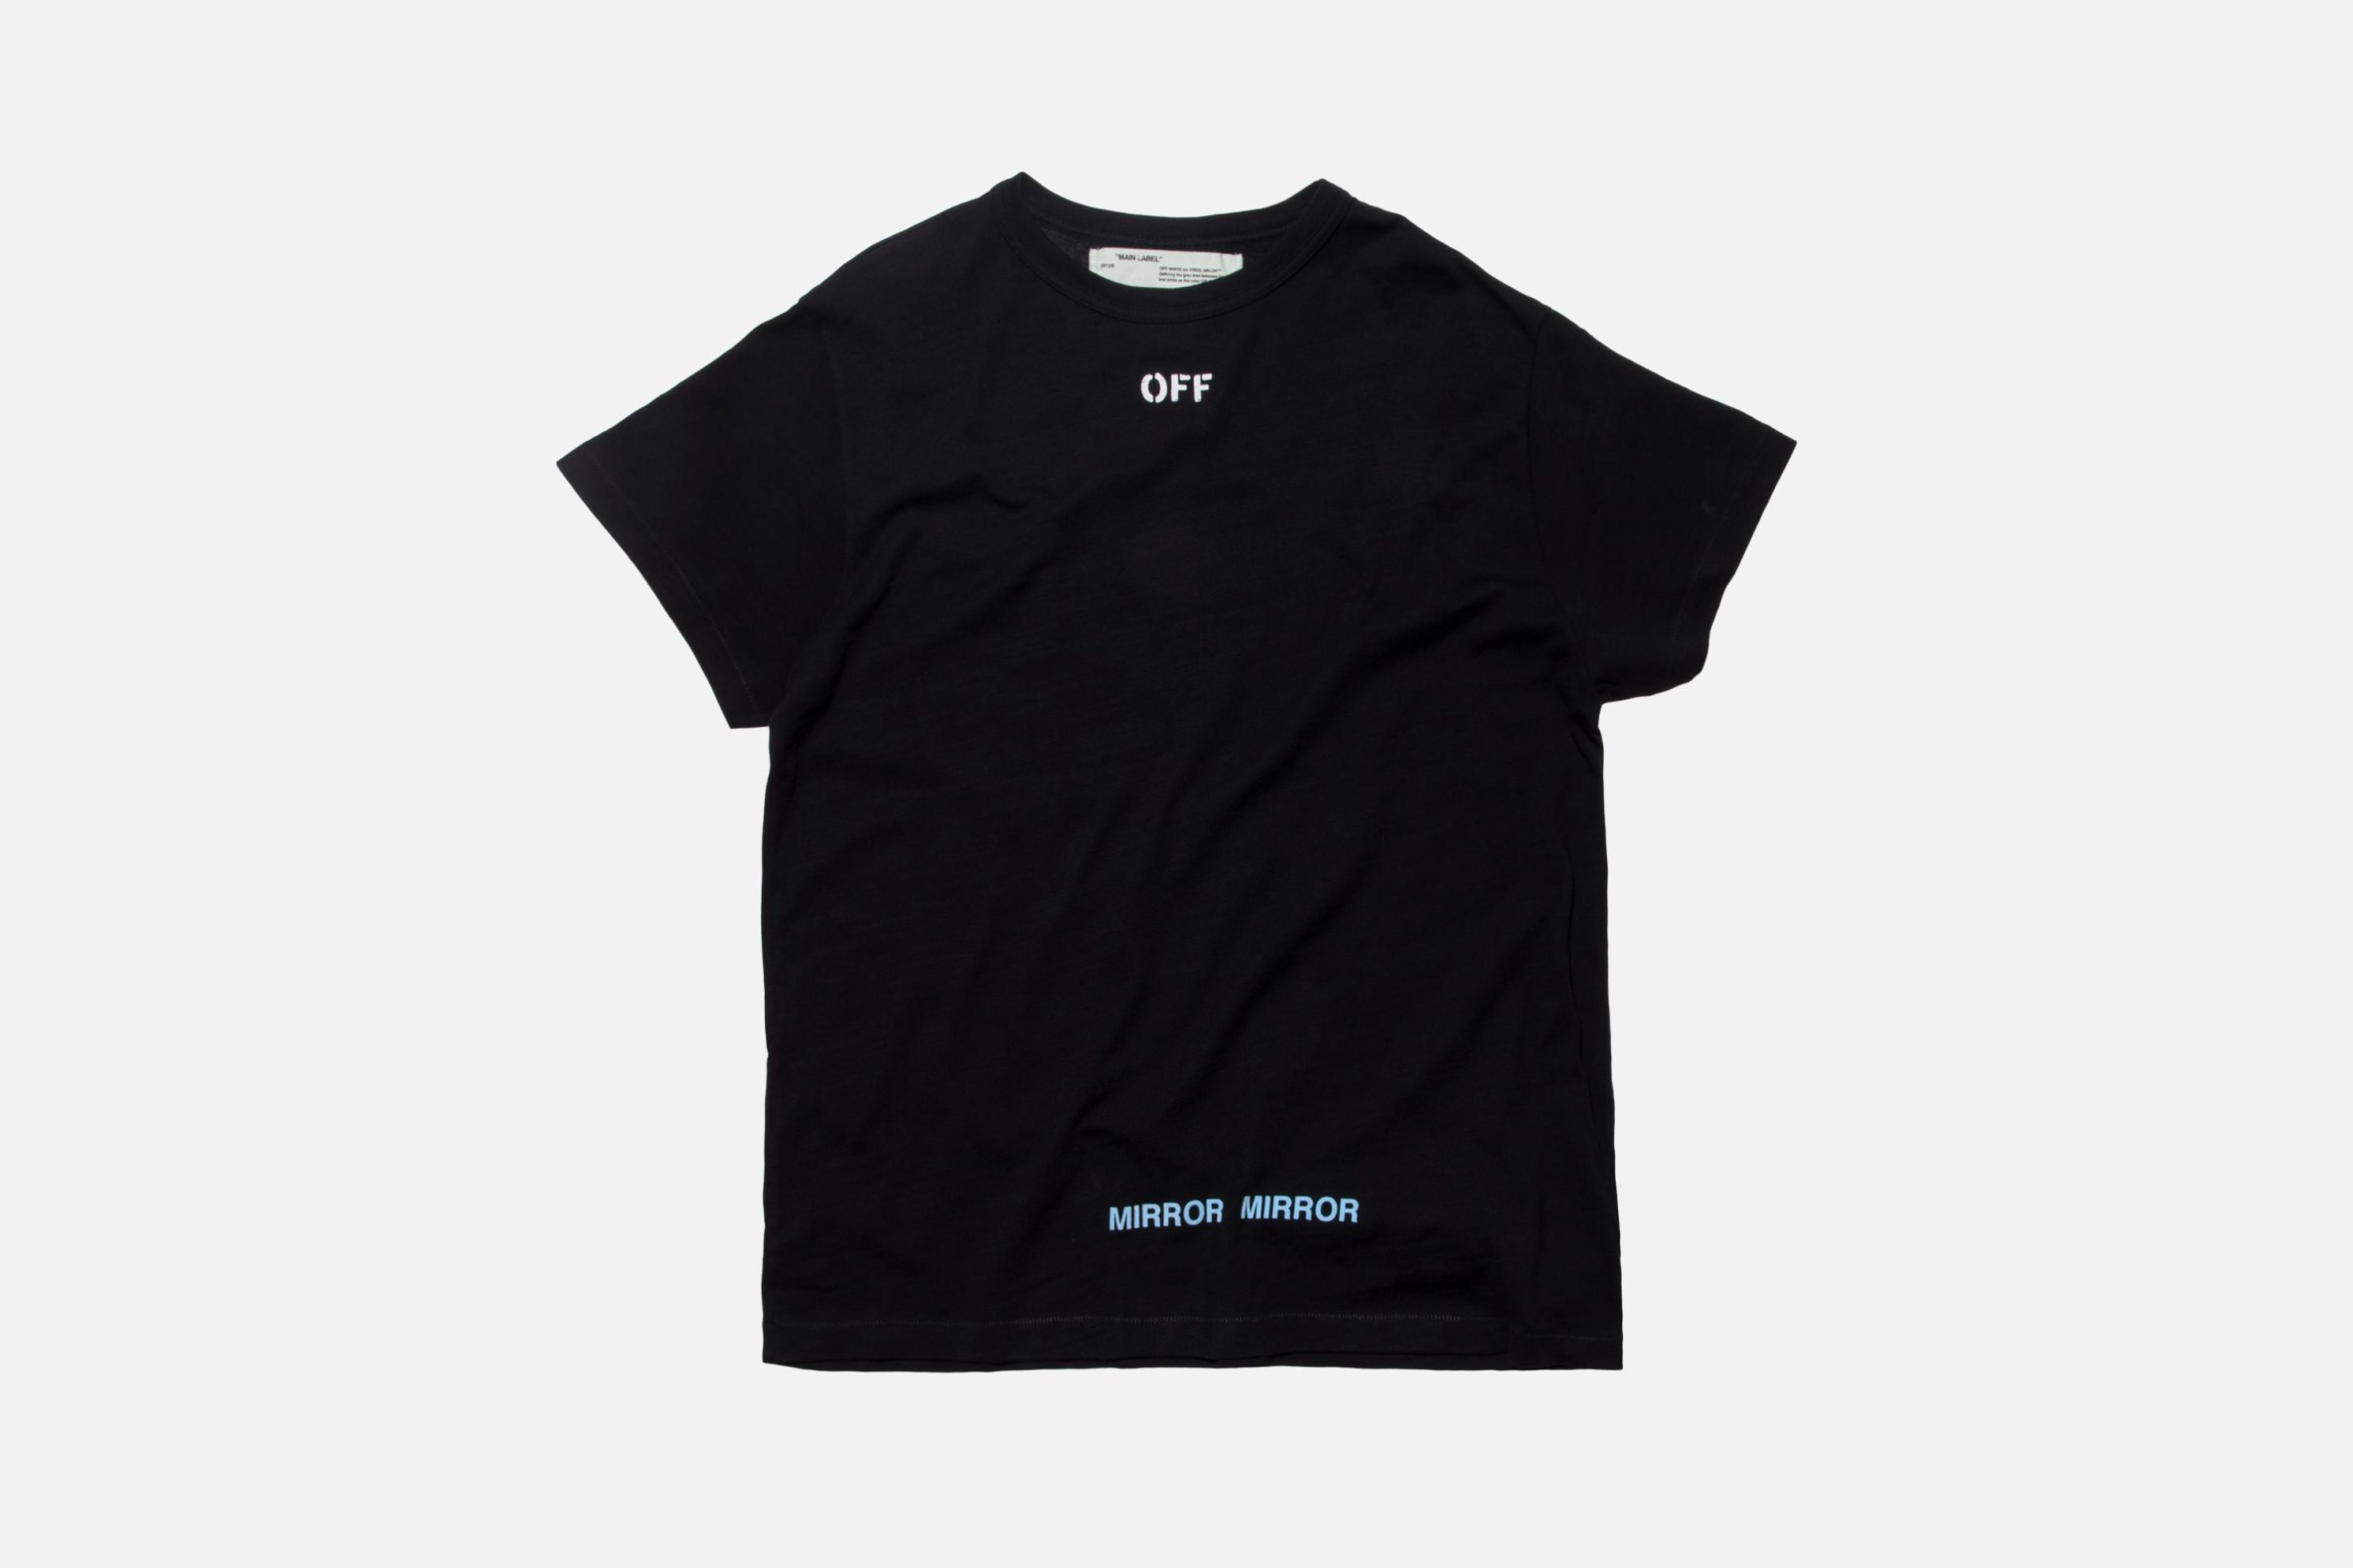 off-white-mirror-mirror-t-shirts-buy-now-2